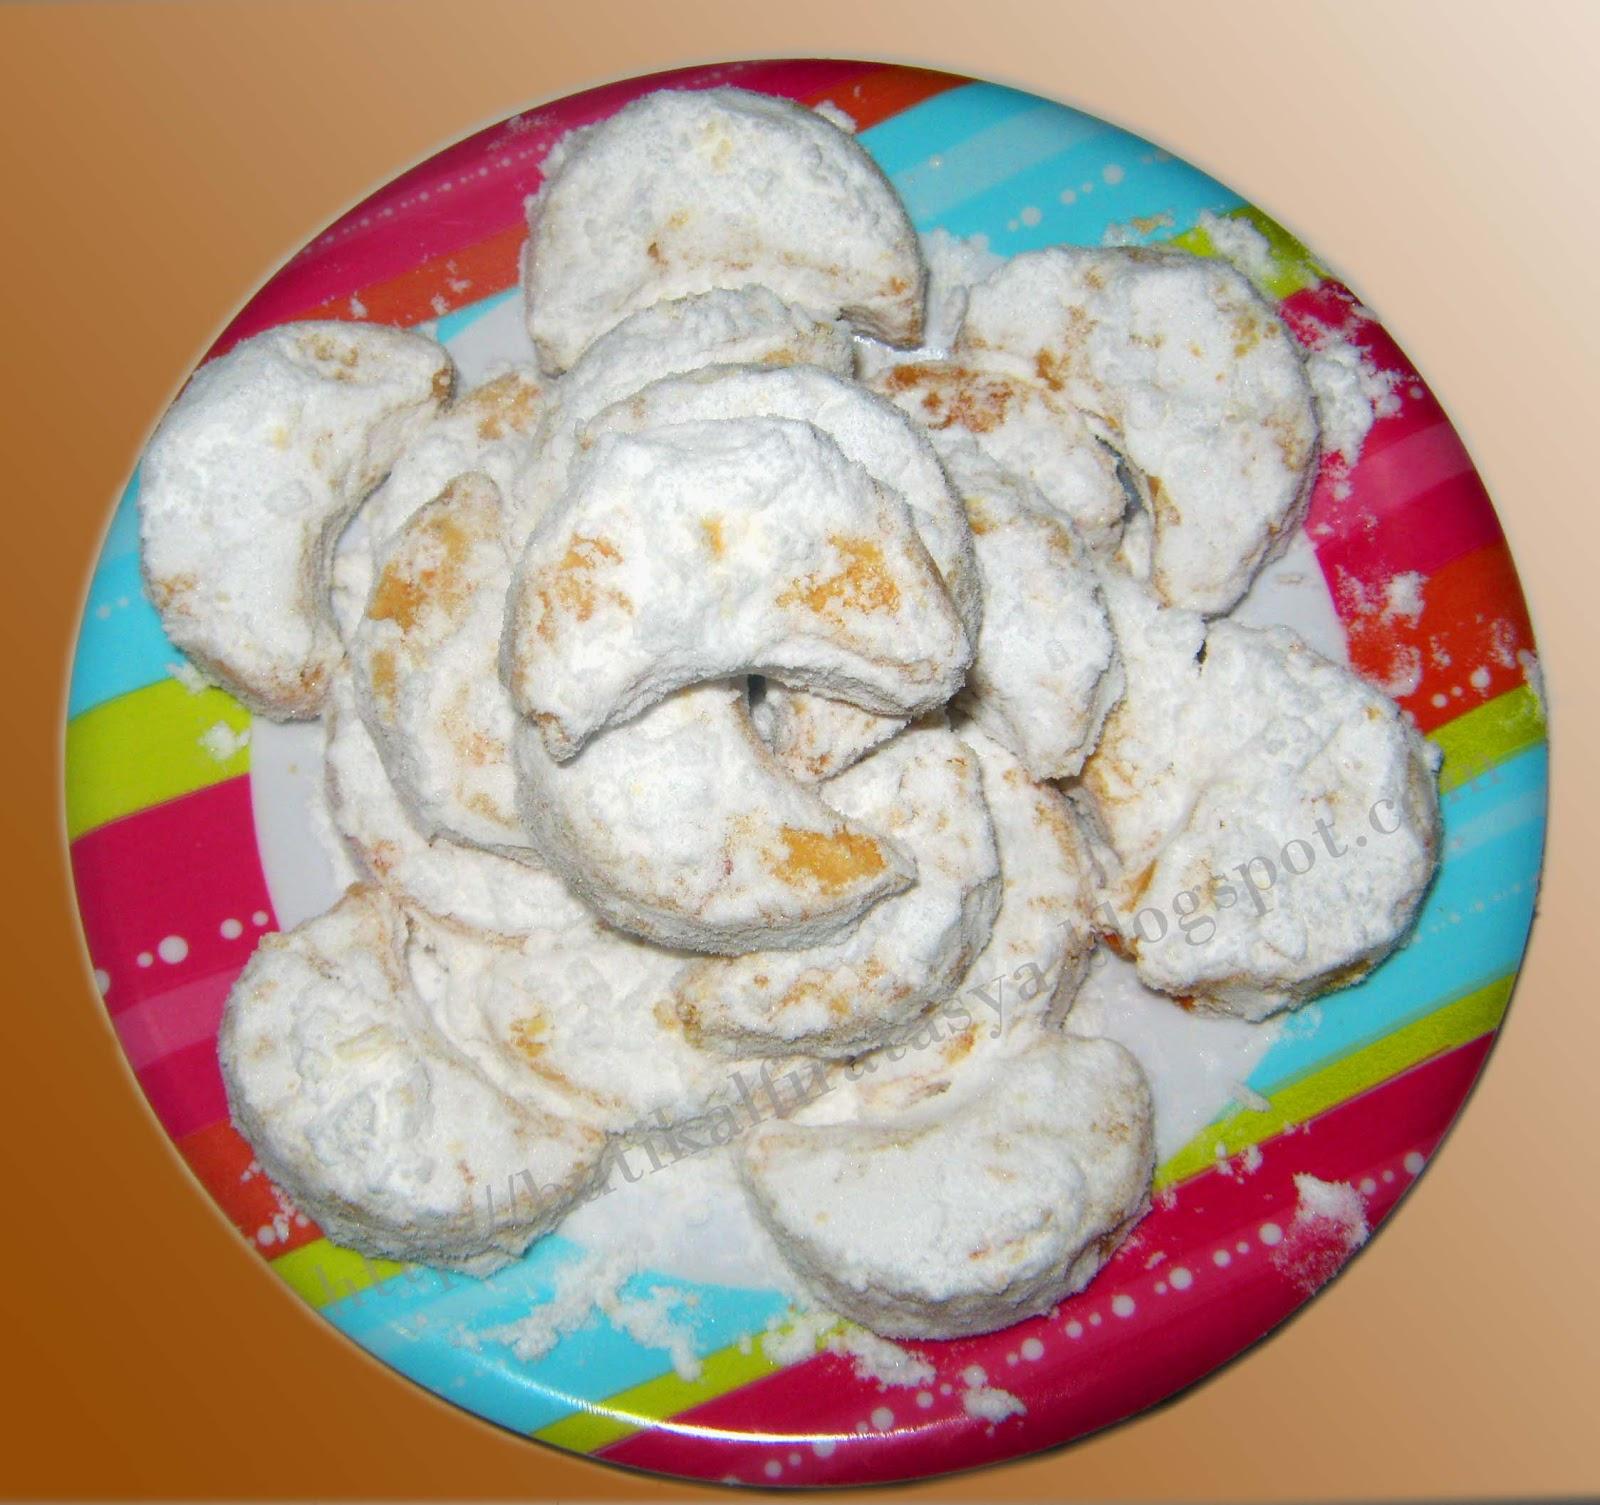 Butik Alfiratasya: Kue Kering Empat Kombinasi